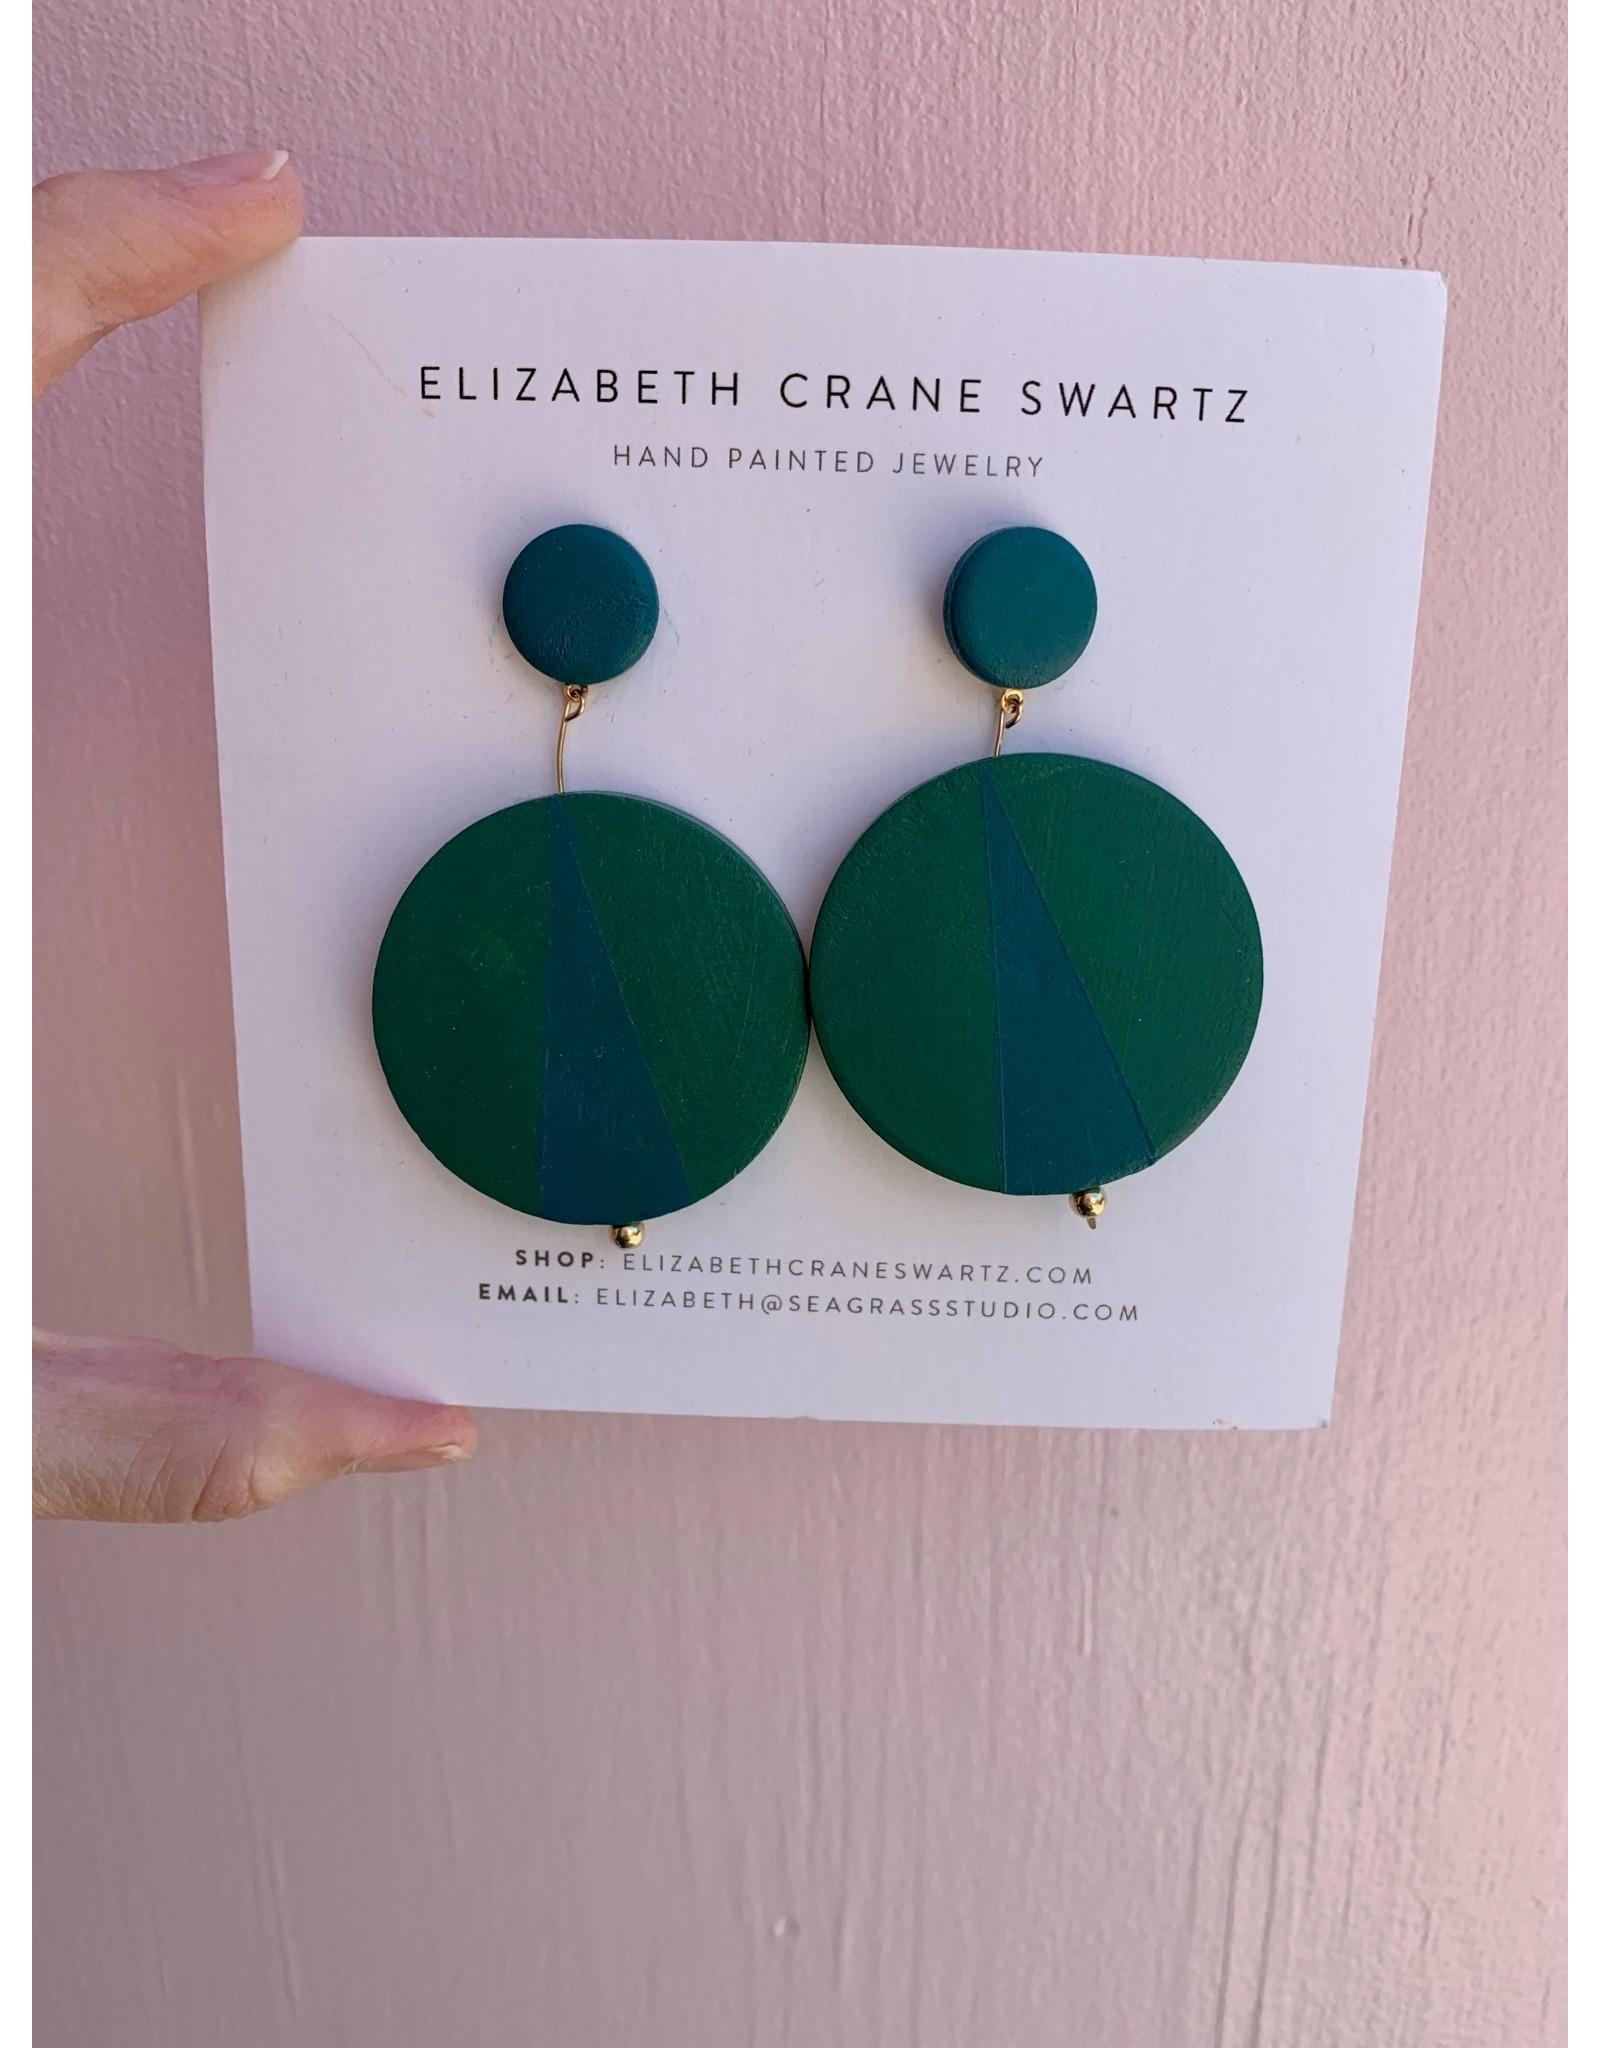 Elizabeth Crane Swartz Green and Teal Drop Earring by Elizabeth Crane Swartz